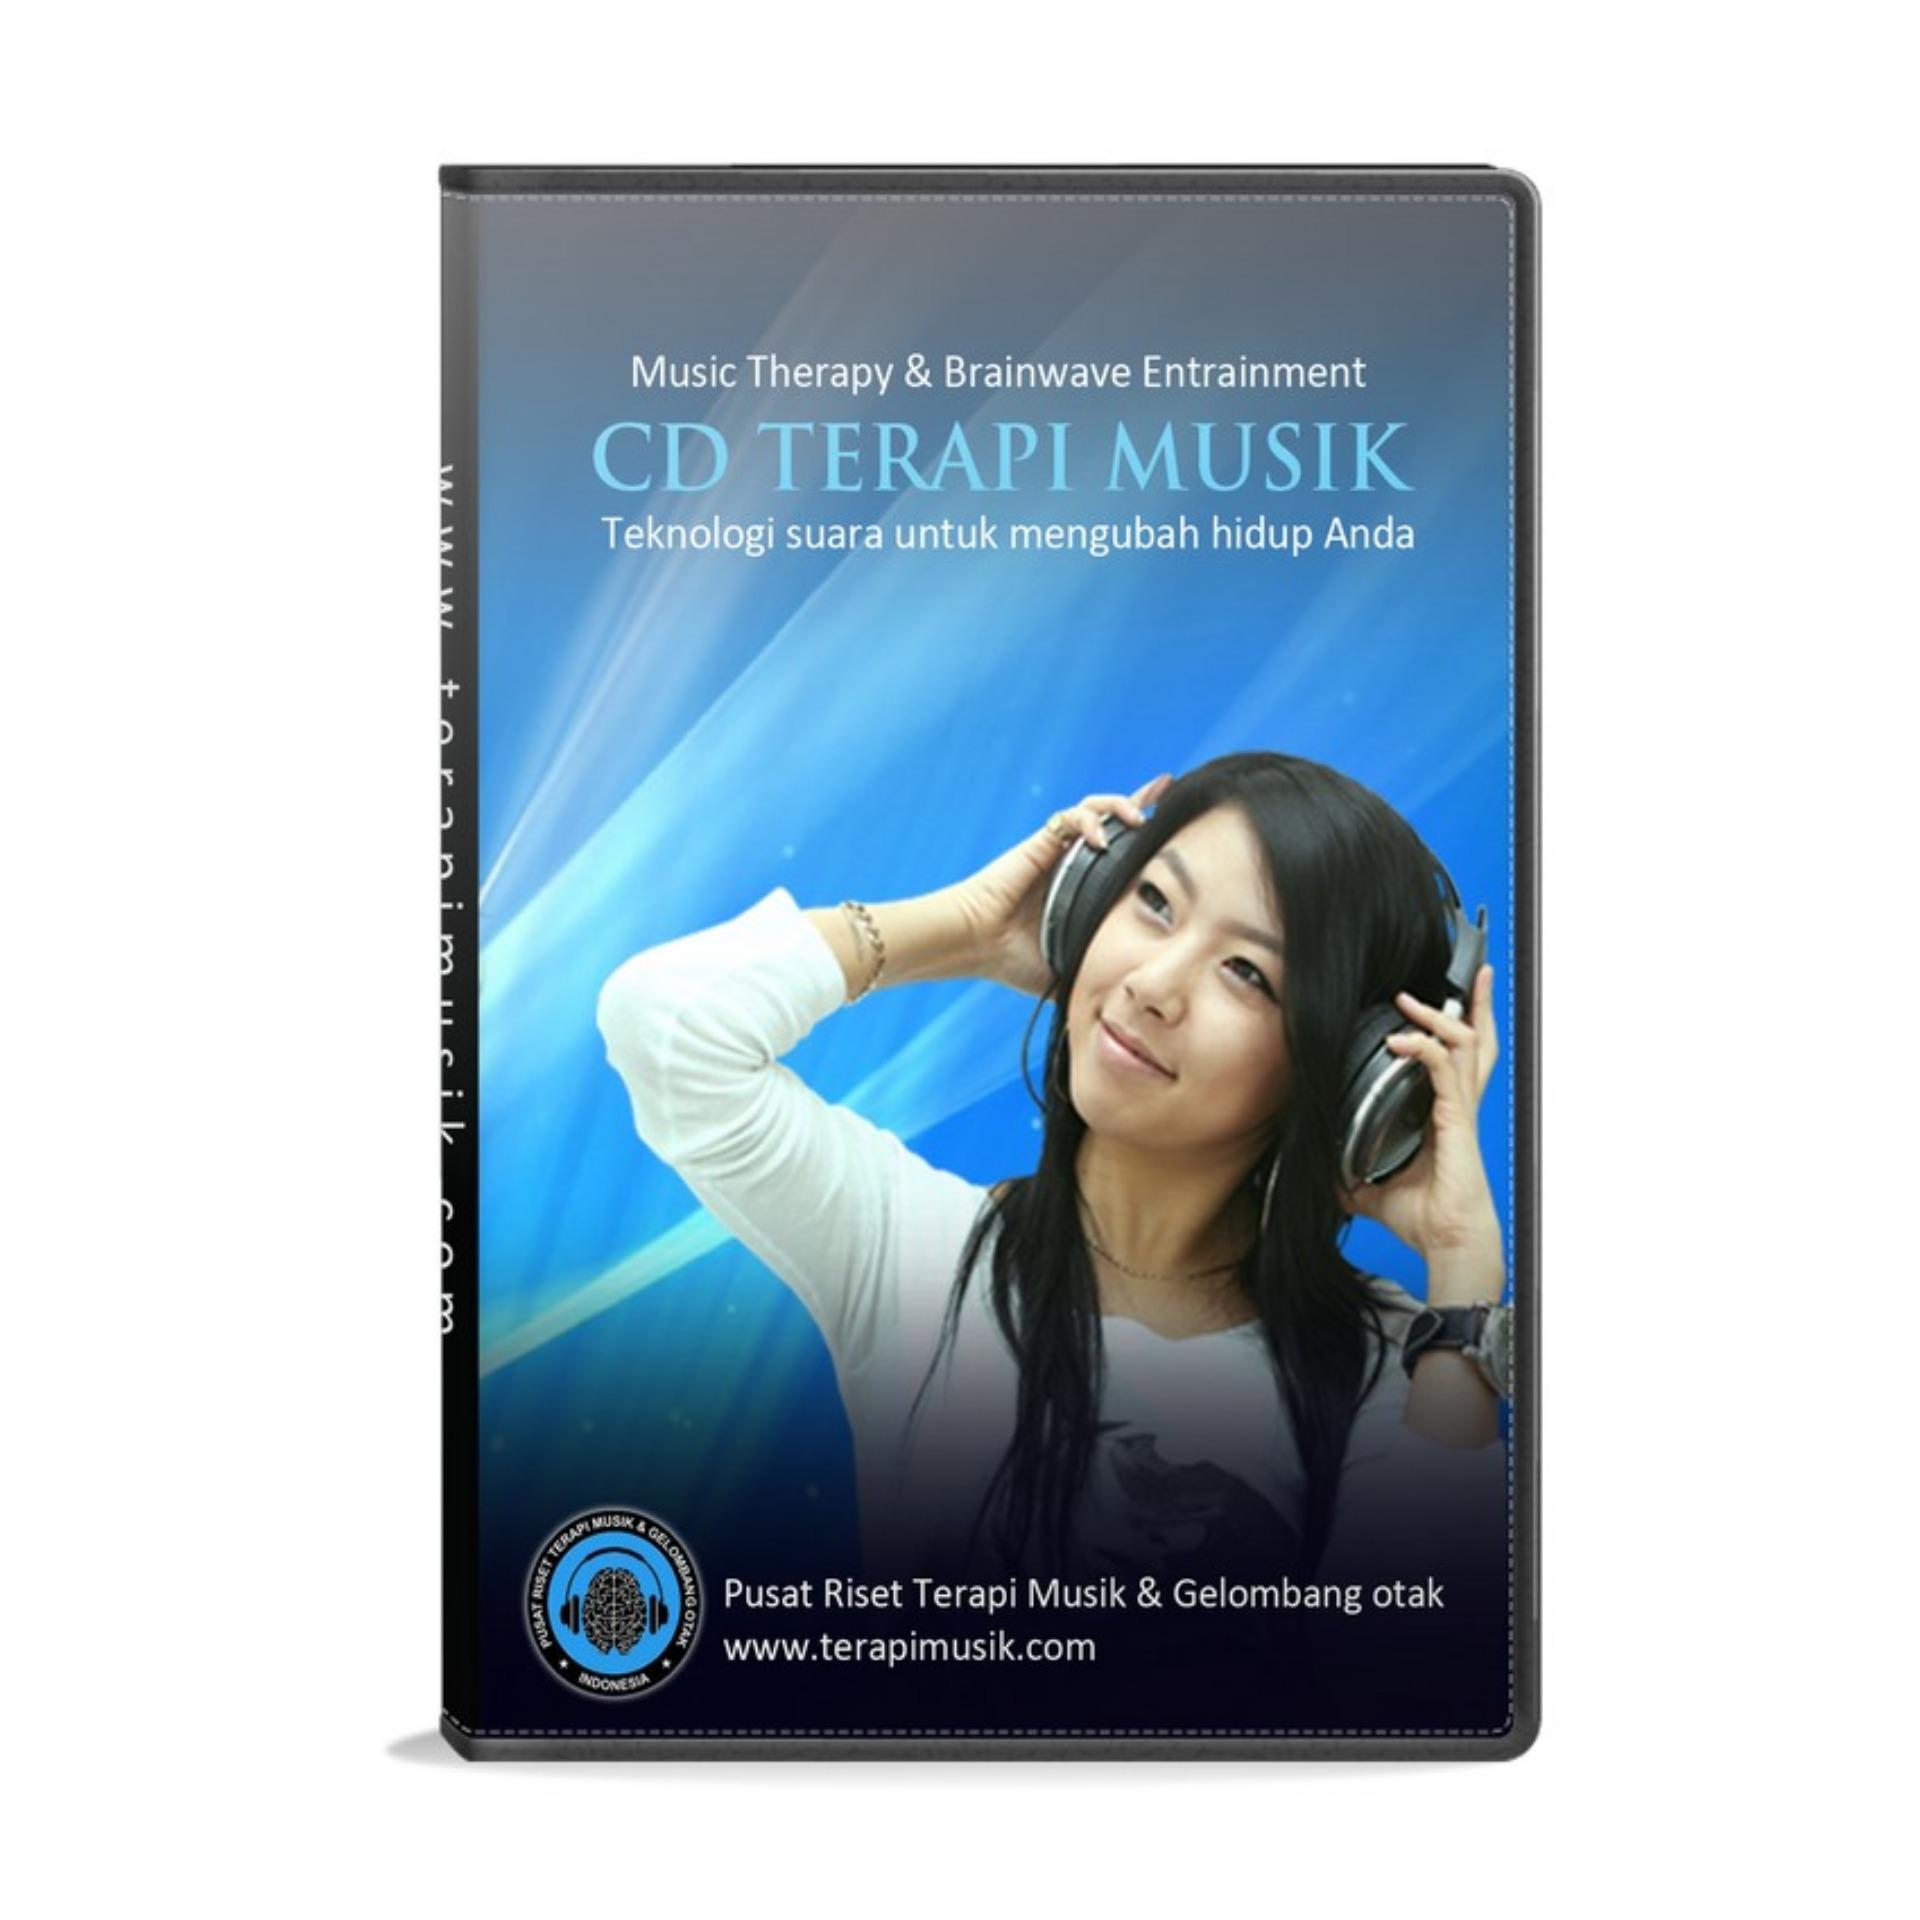 Terapi Musik Healthy Menstruation (mengatasi Gangguan Mestruasi) By Terapi Musik.